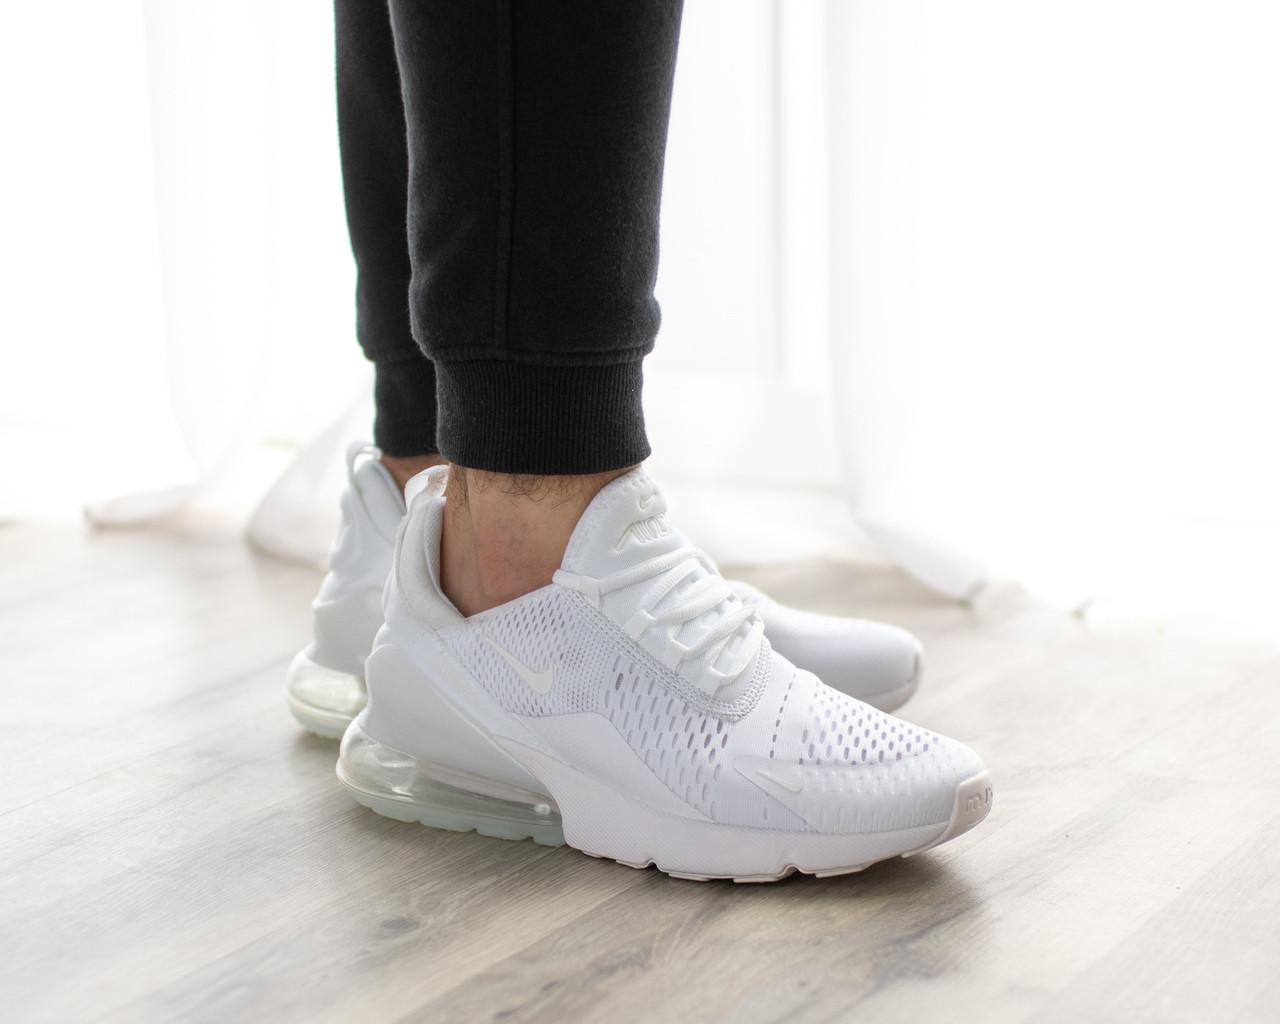 Женские кроссовки в стиле Nike Air Max 270 All White (39, 40 размеры)